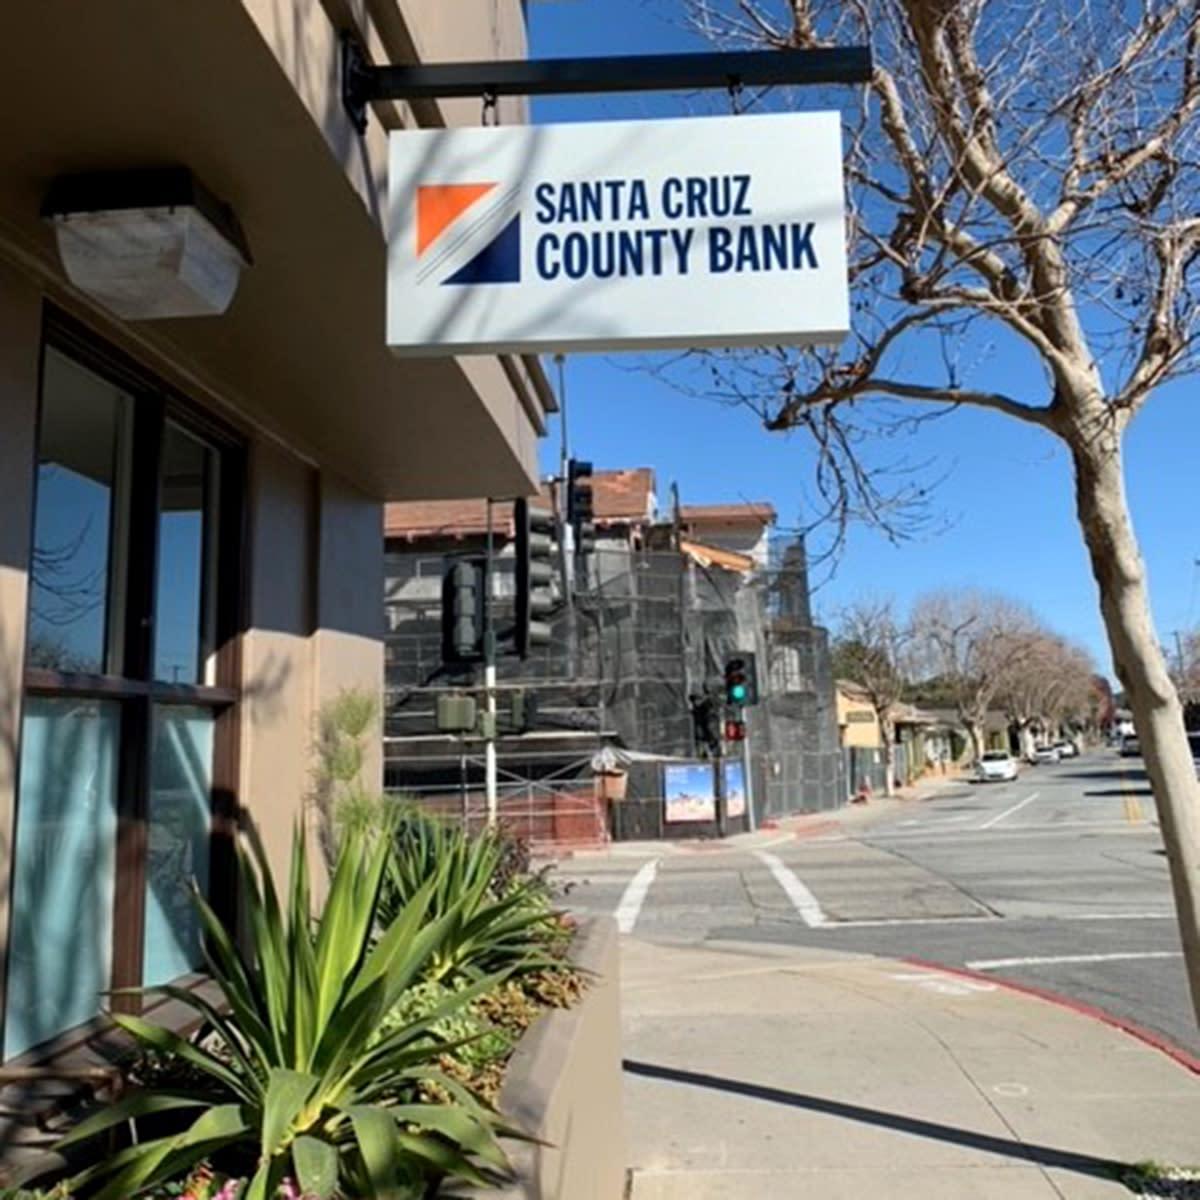 Side Exterior View of Santa Cruz County Bank, Monterey Branch on Munras Avenue